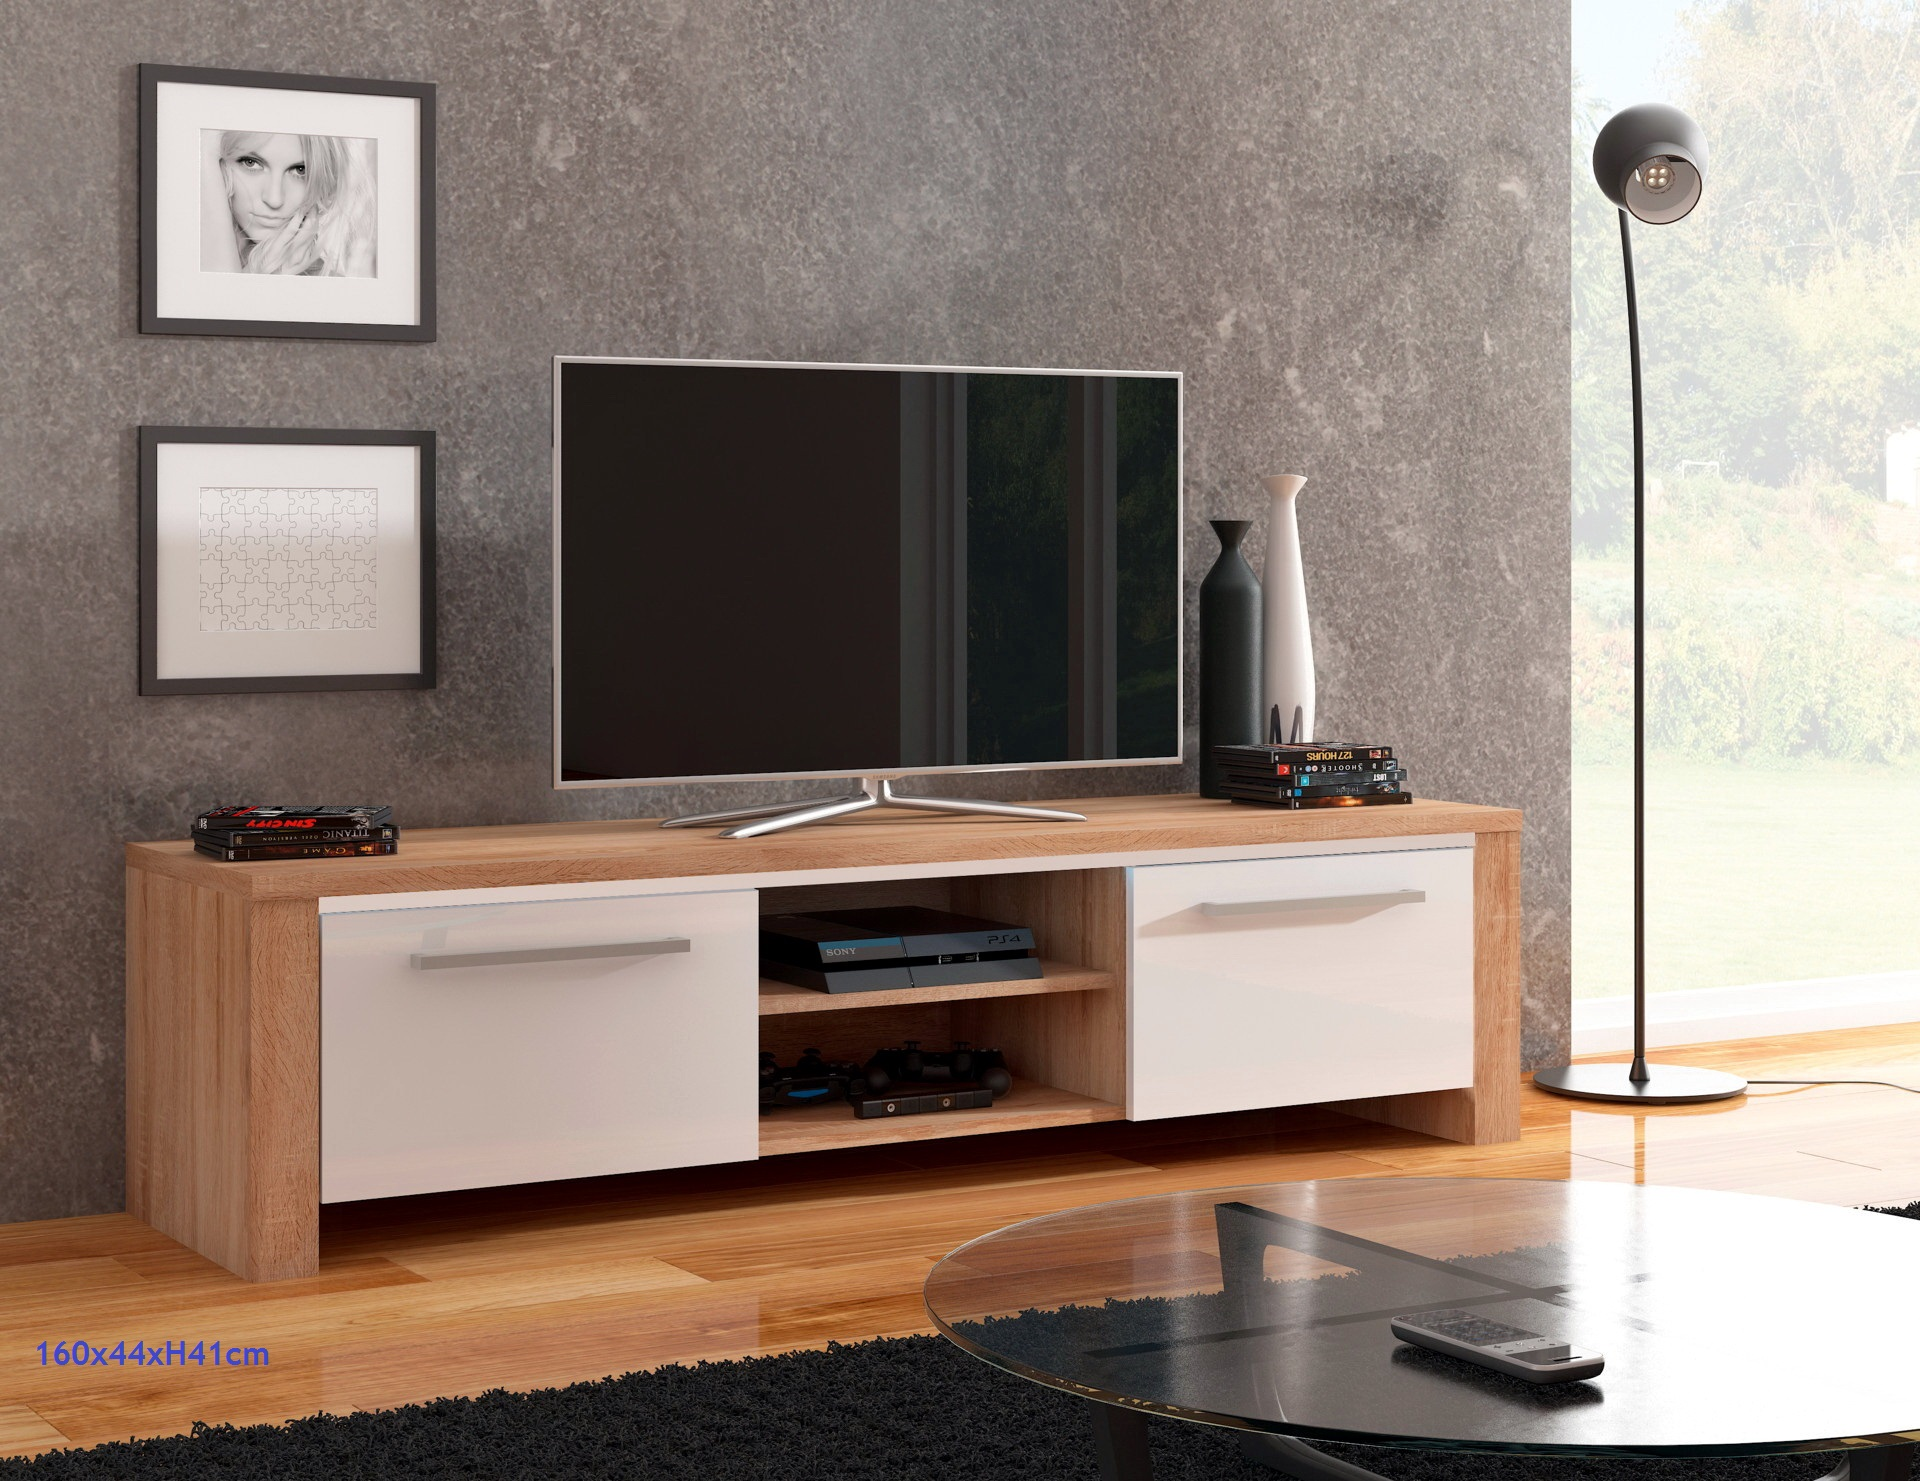 Mesas tv low cost by herdasa muebles anto n - Muebles low cost ...